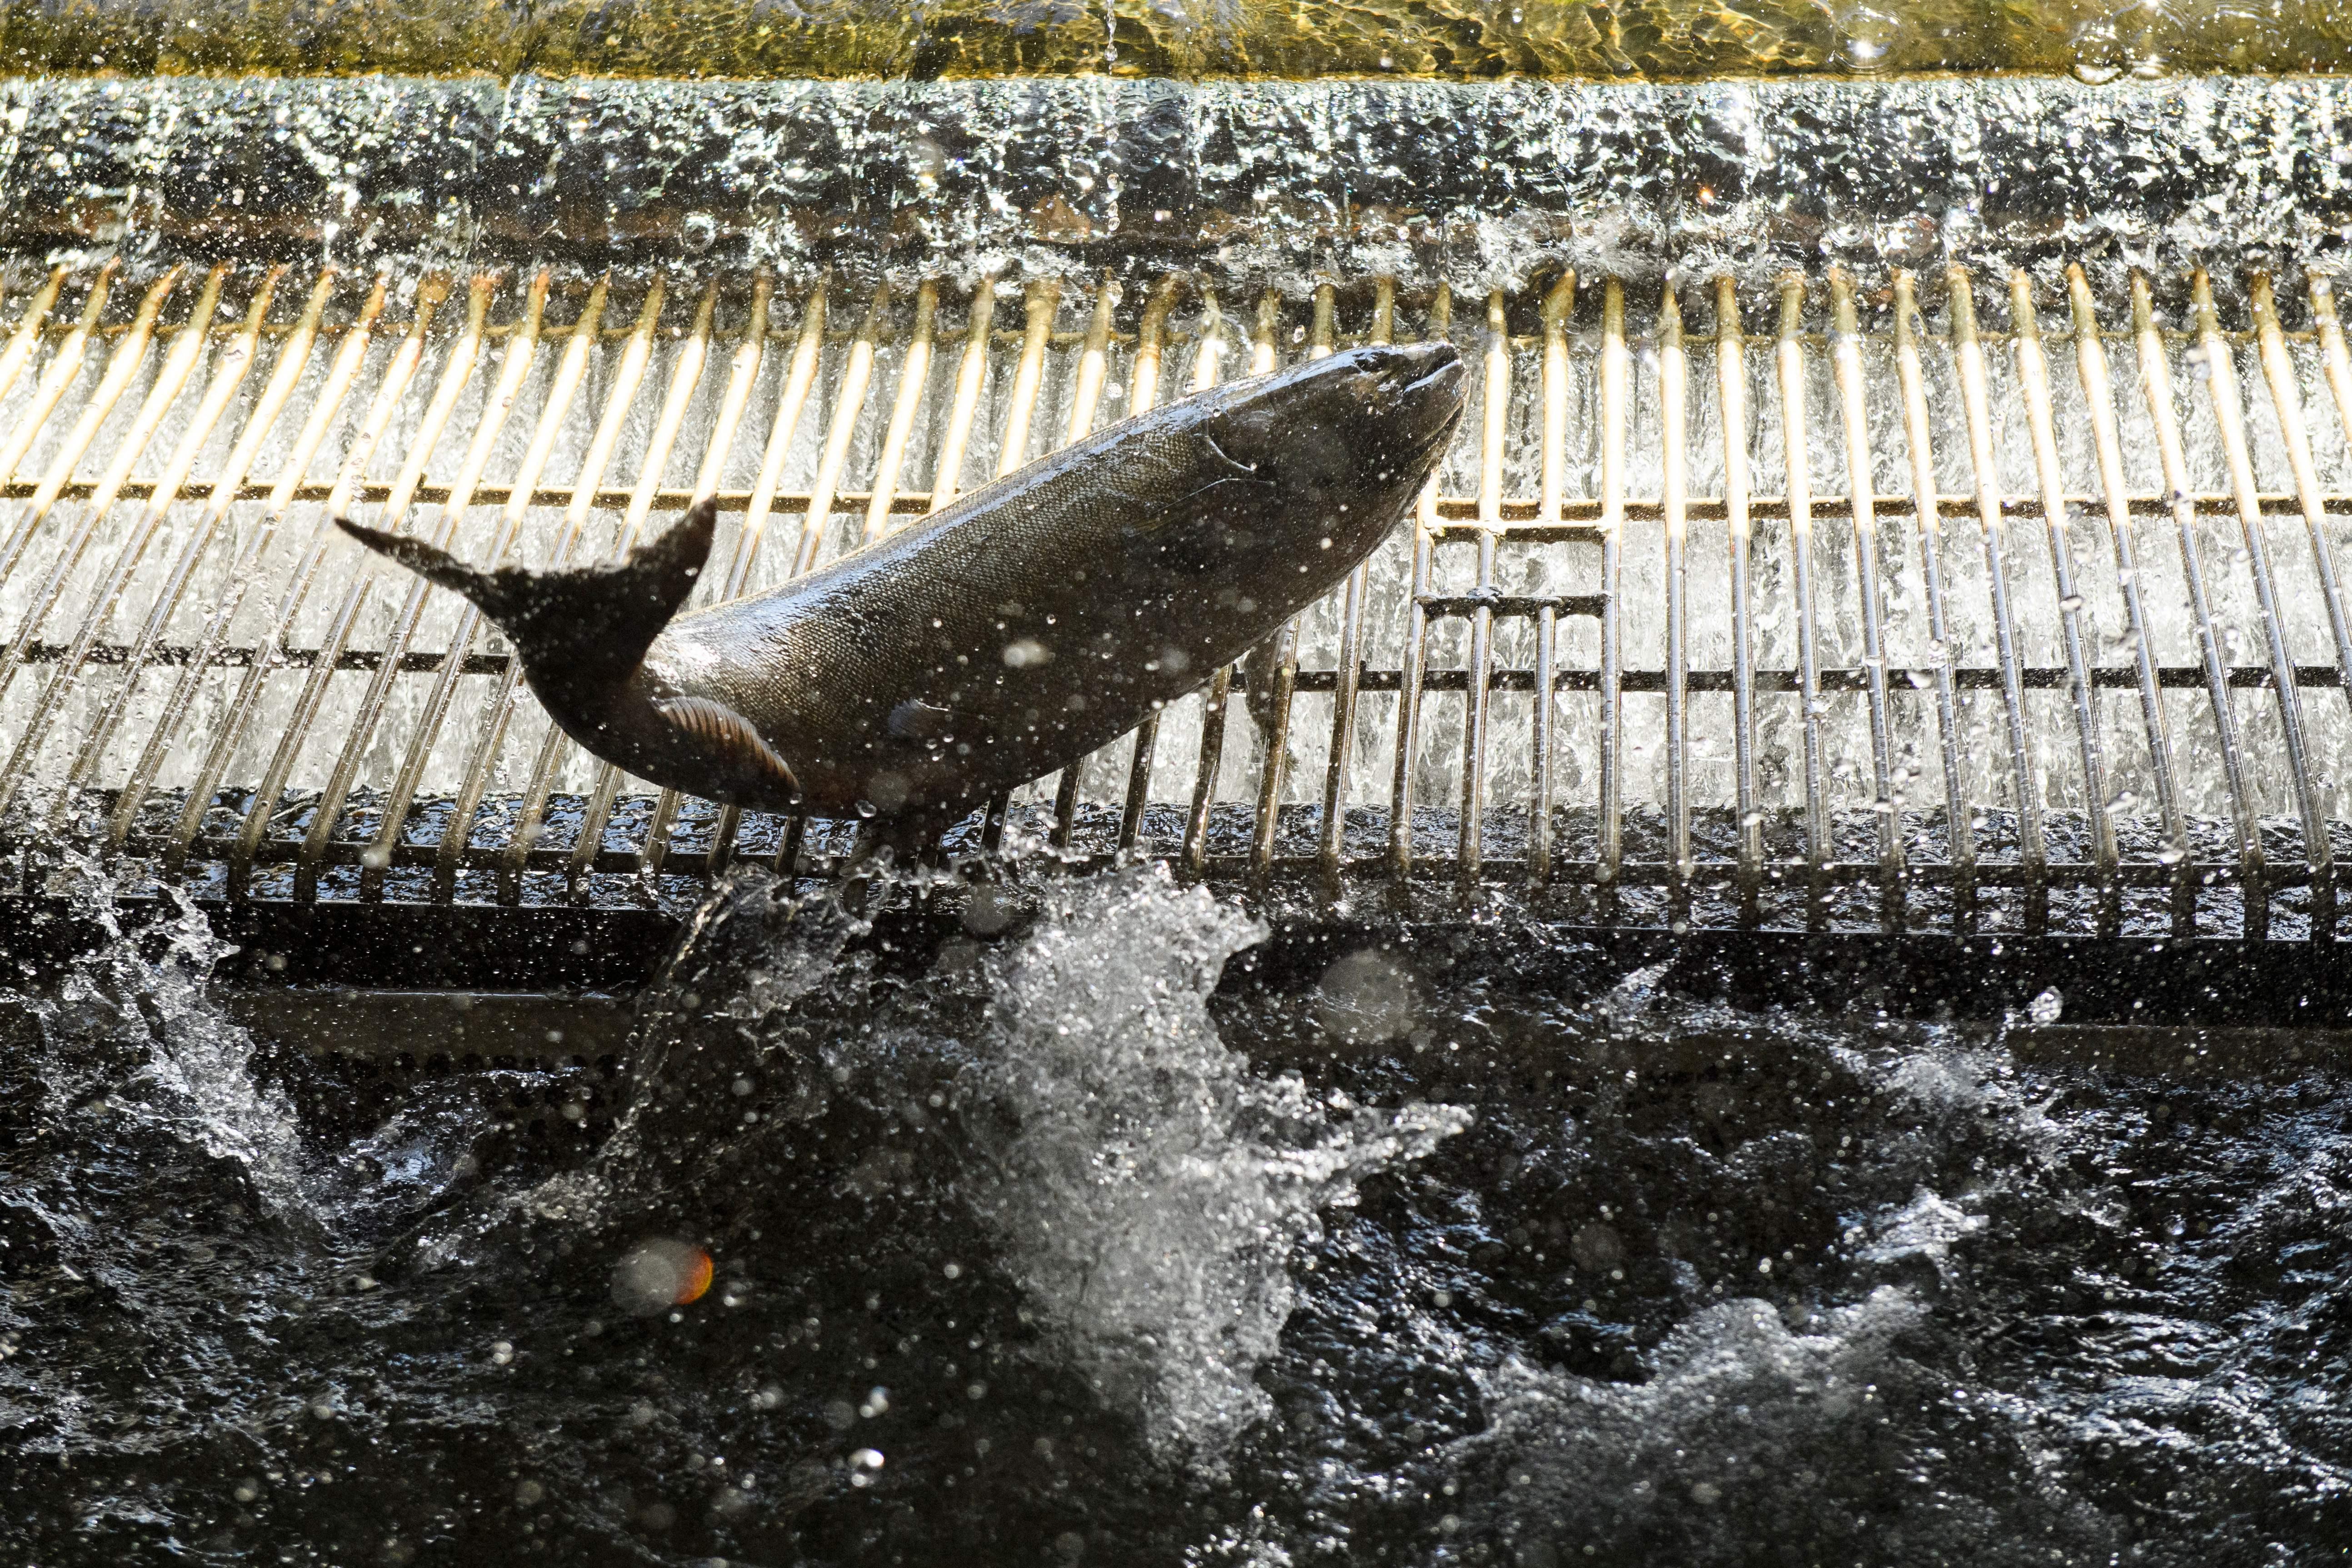 US-ENVIRONMENT-DROUGHT-FISHING